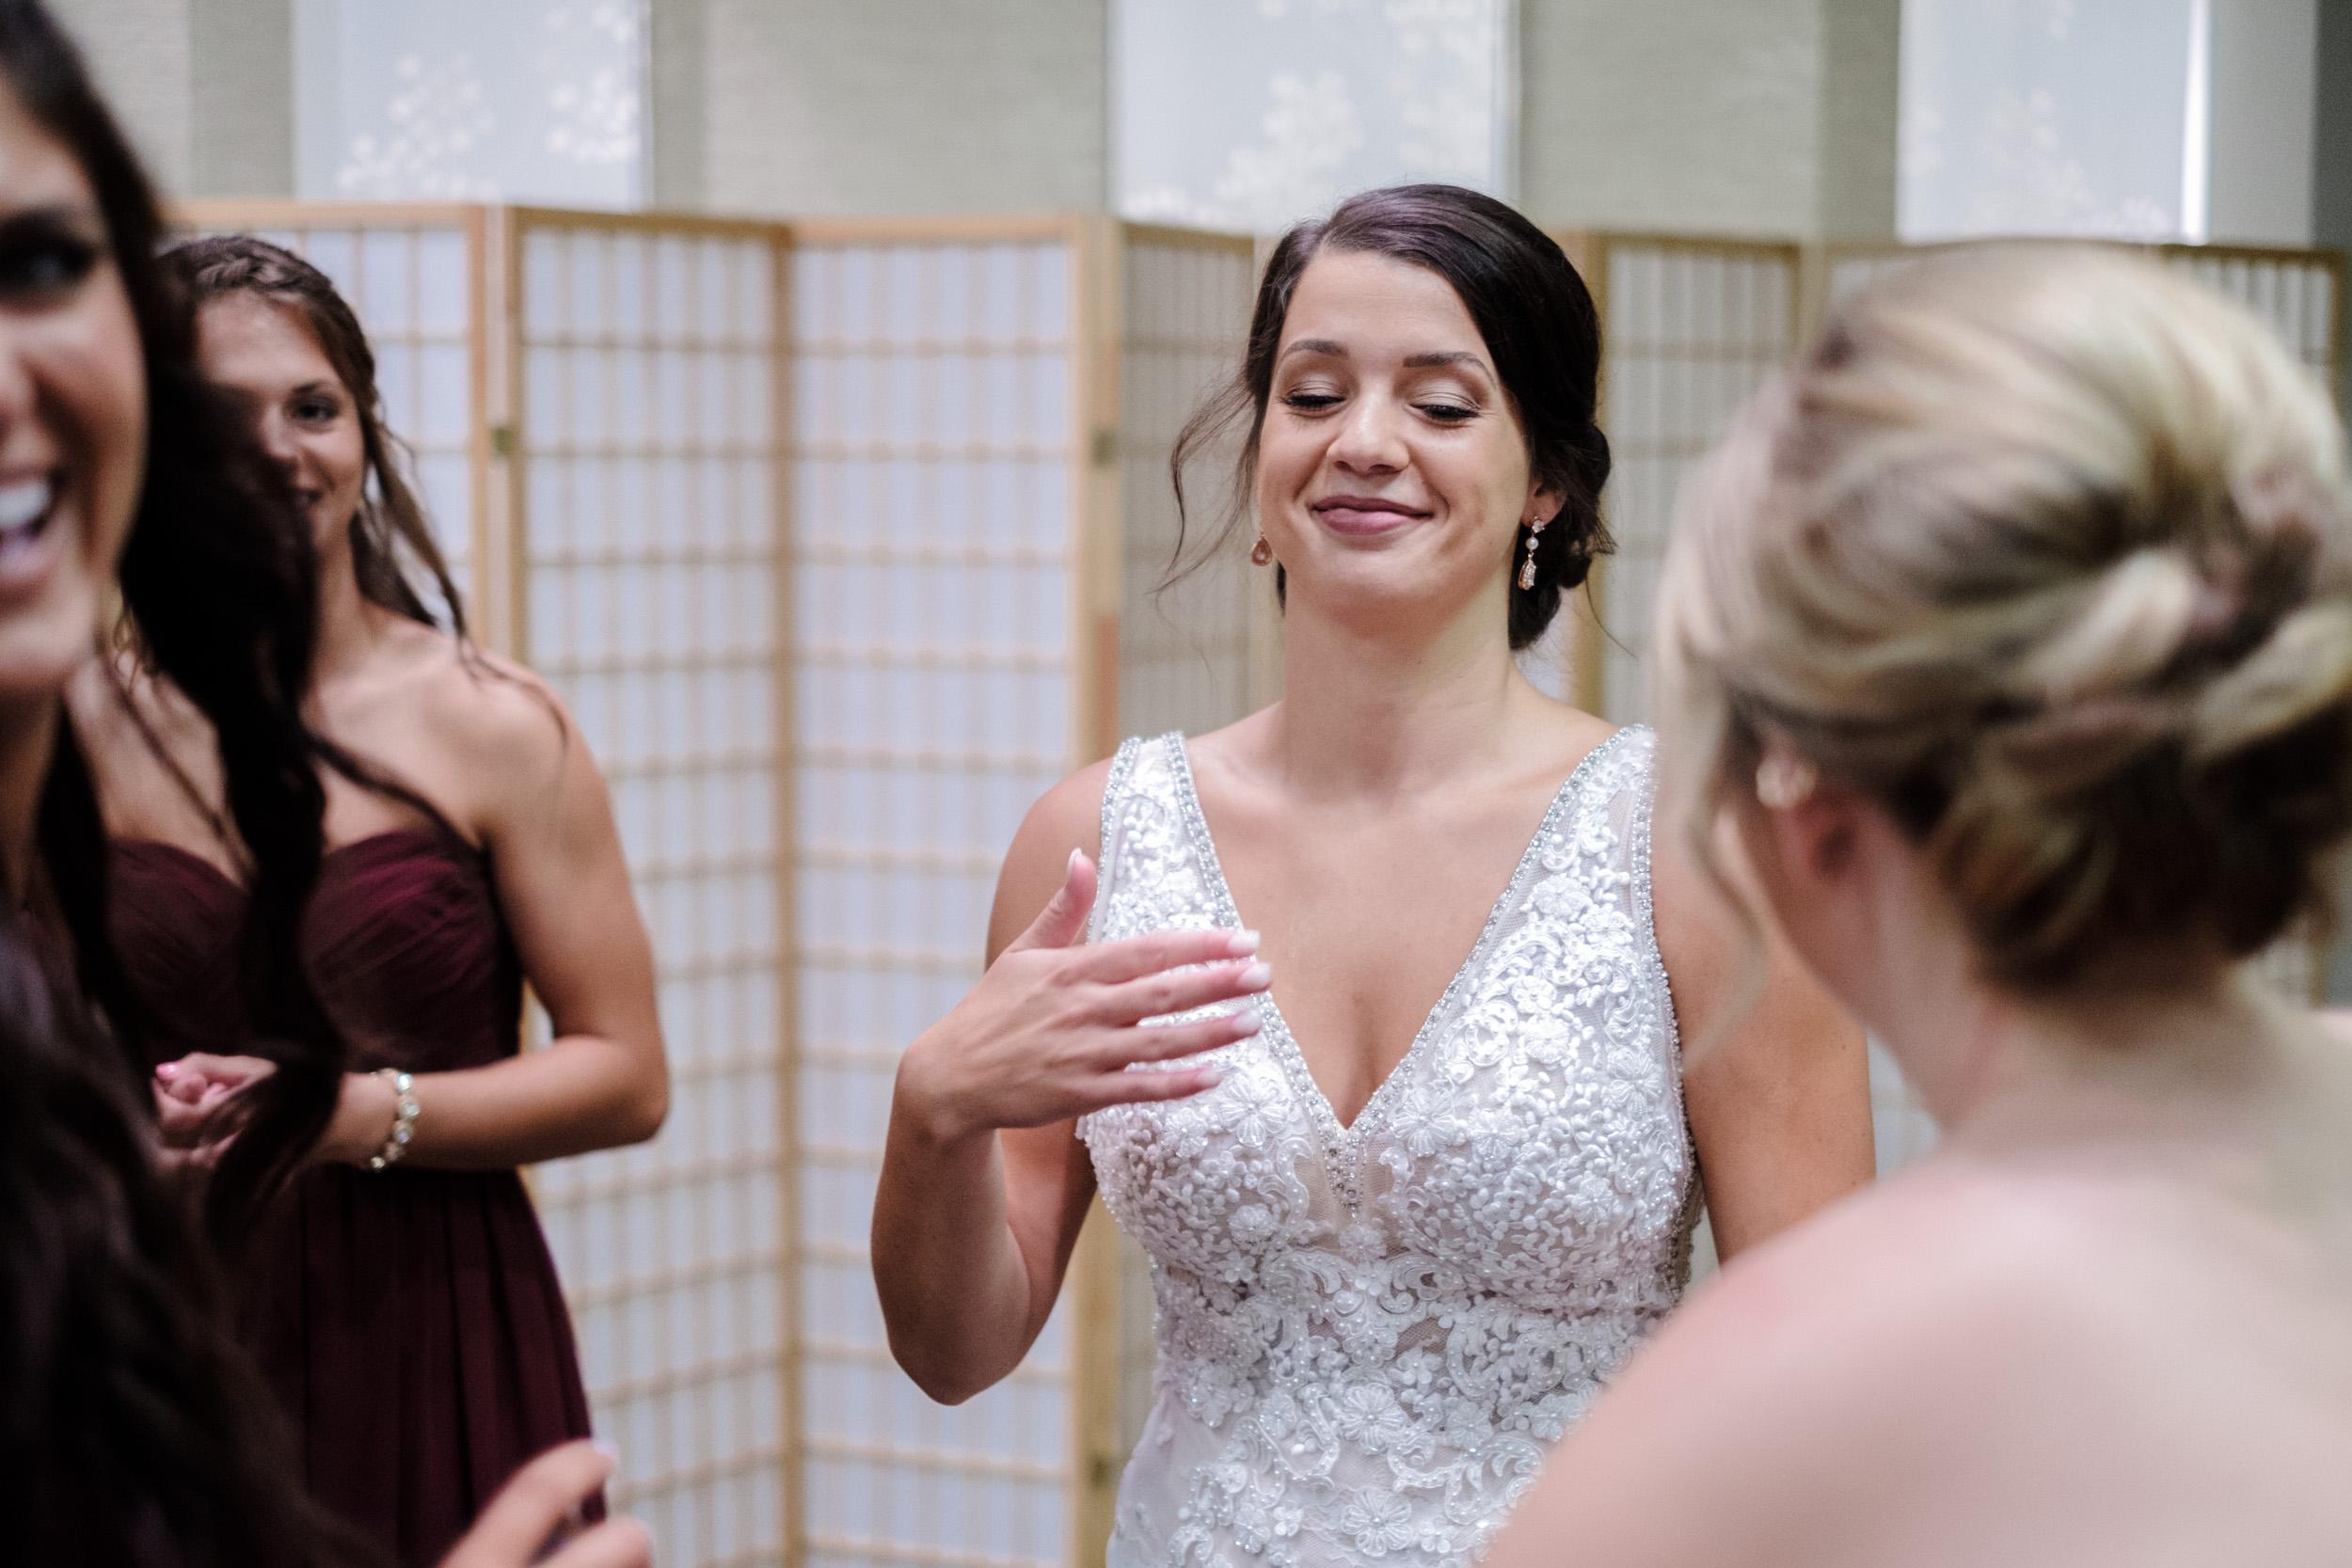 18-09-01 BAP Kiley-Trevor-Anderson-Gardens-Wedding-12.jpg